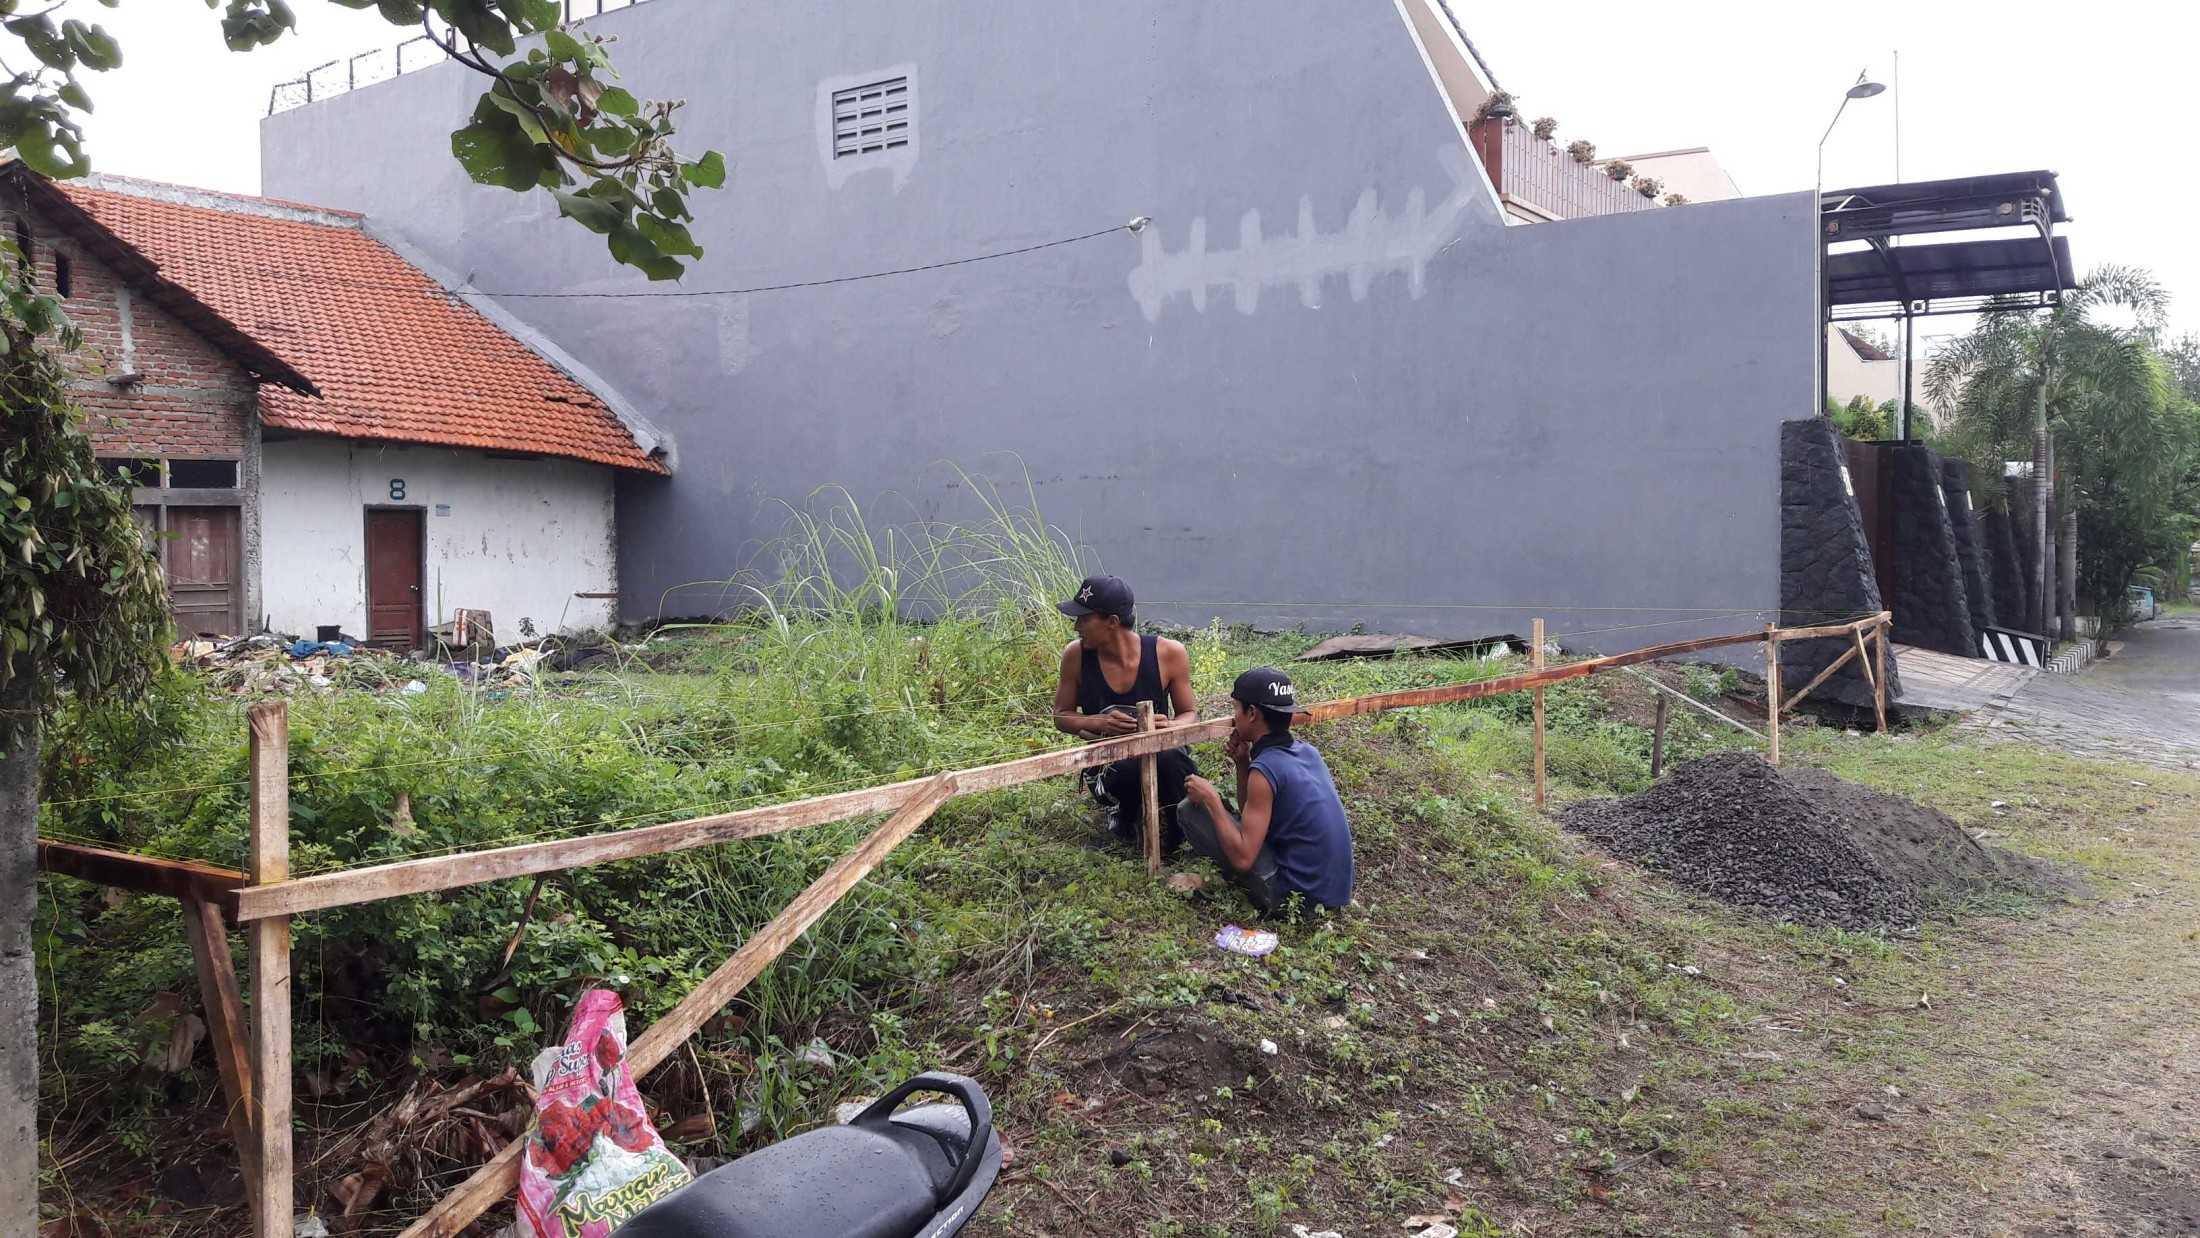 Gradasi Sam House Surabaya, Kota Sby, Jawa Timur, Indonesia Surabaya, Kota Sby, Jawa Timur, Indonesia Gradasi7-Rumah-Bpk-Sam  88988